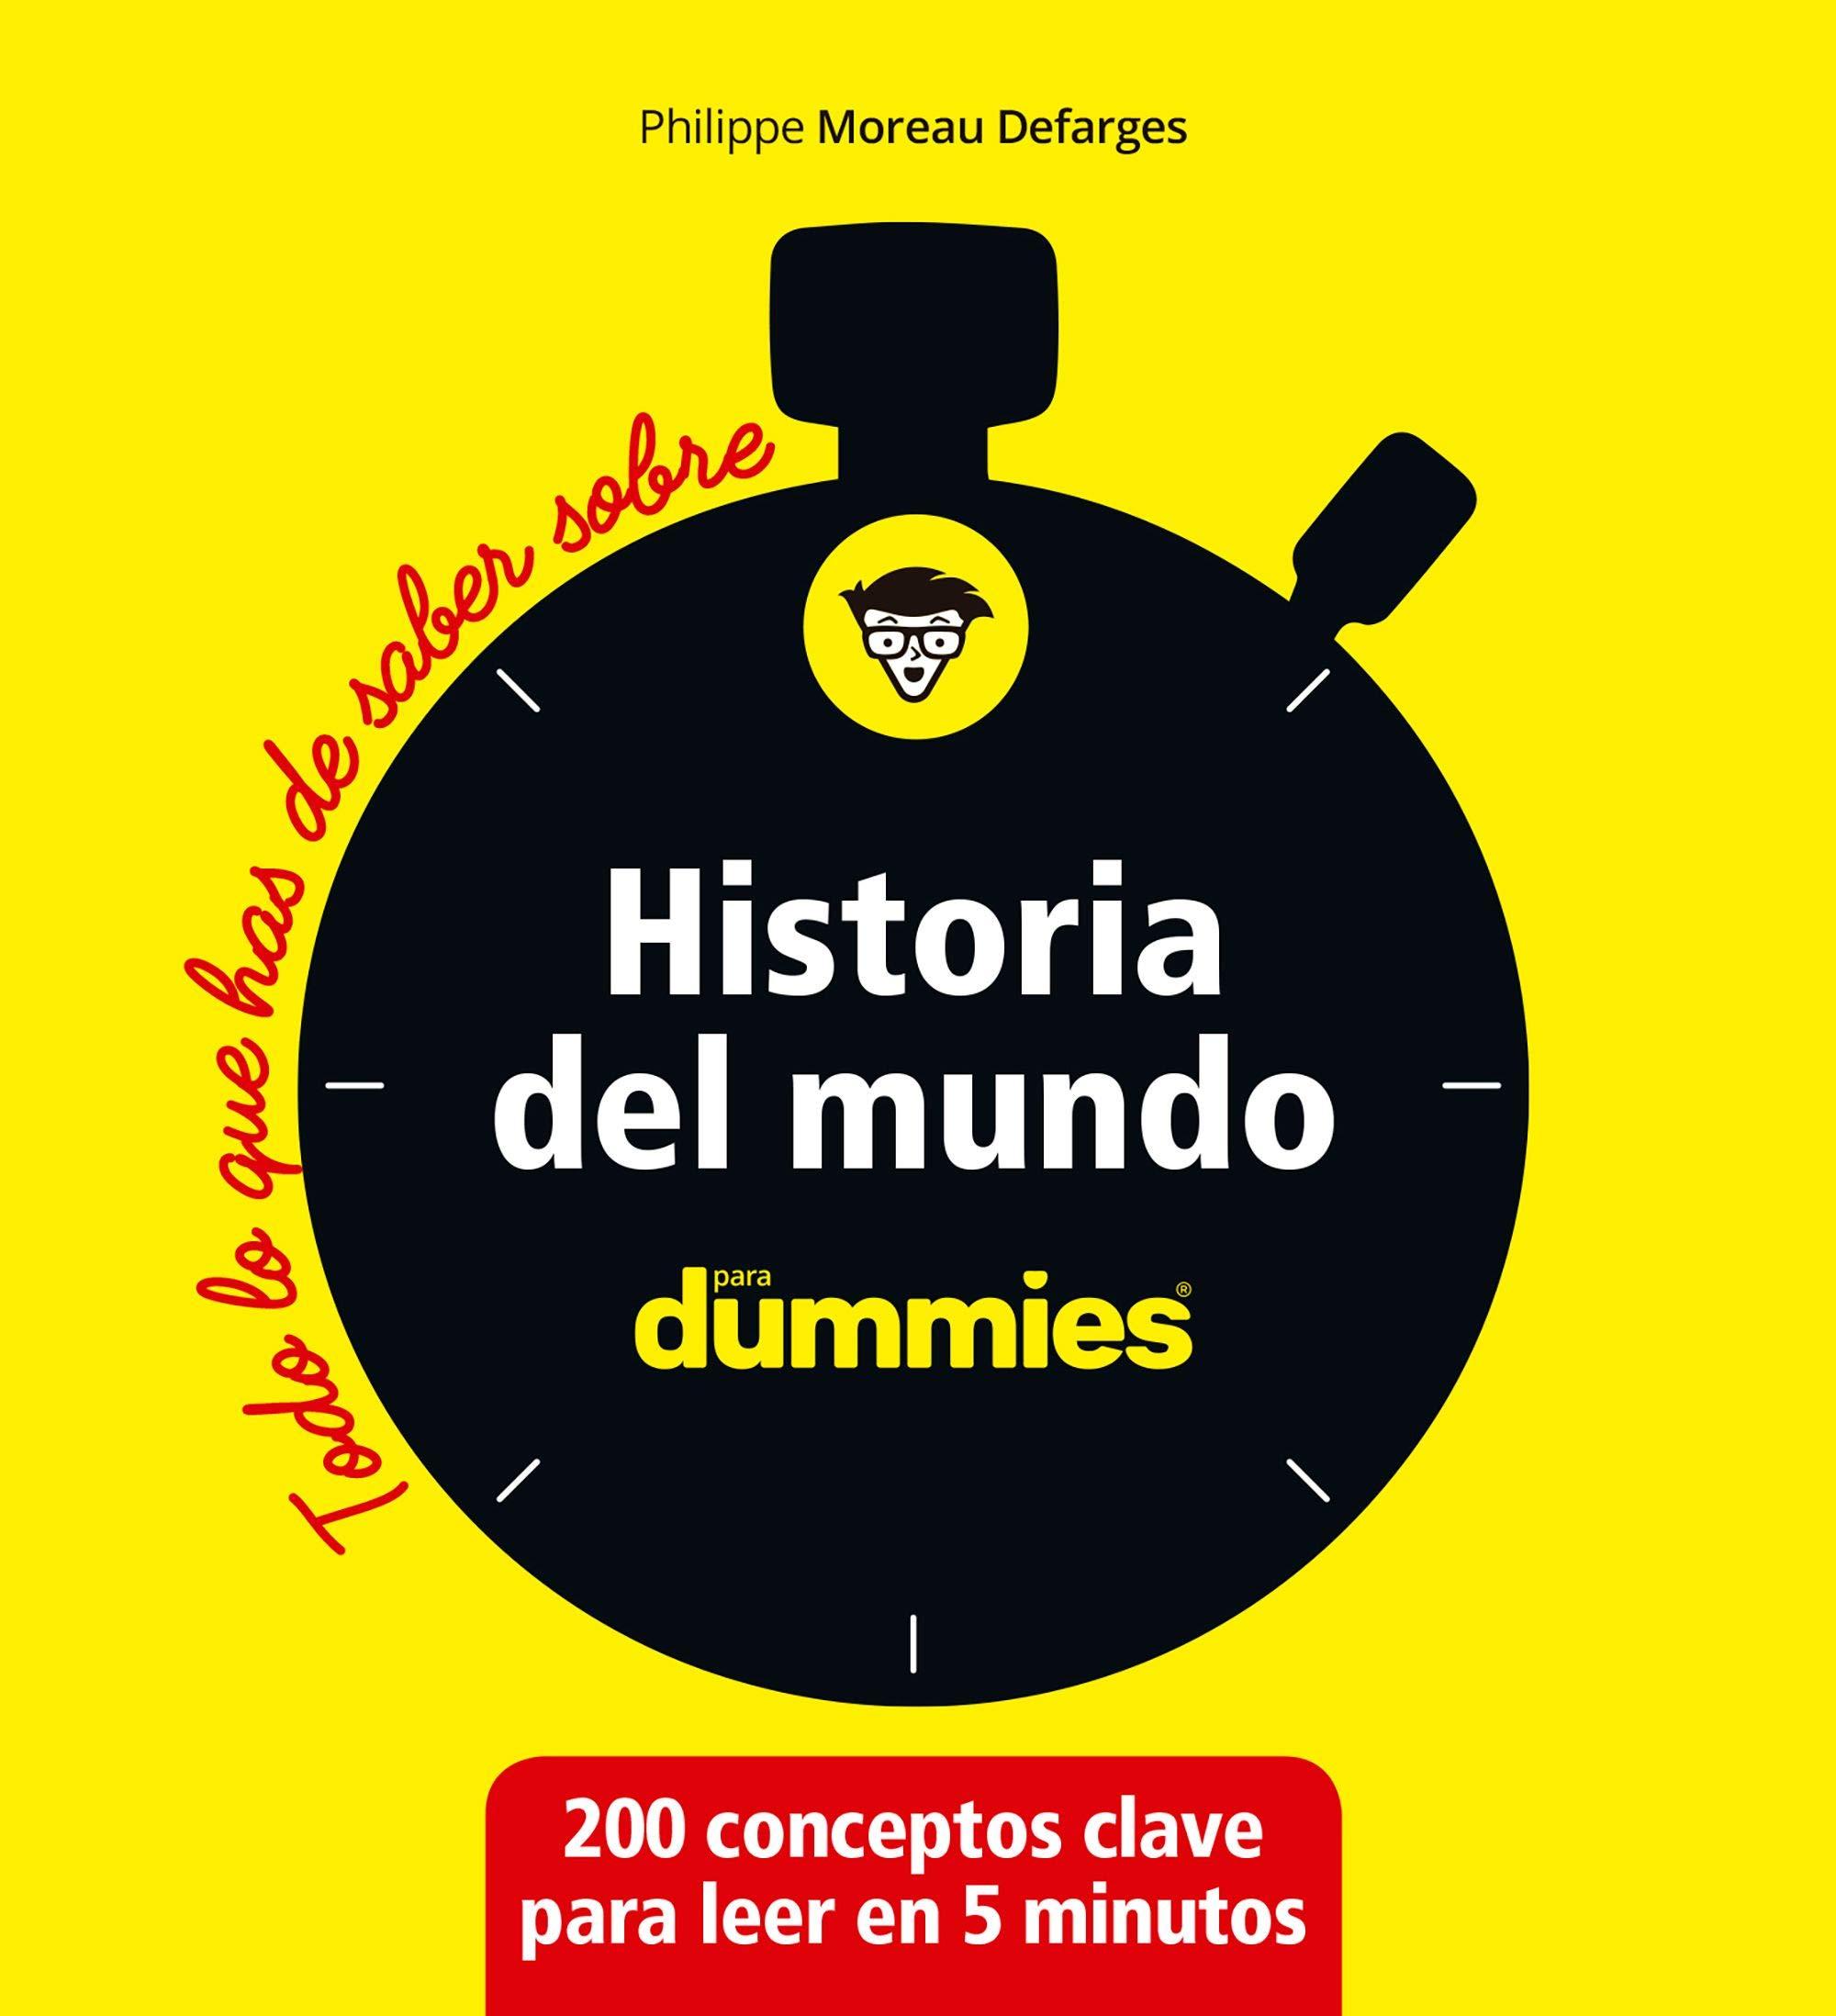 Historia del mundo (Para Dummies): Amazon.es: Moreau Defarges, Philippe, González Fernández, Paula: Libros